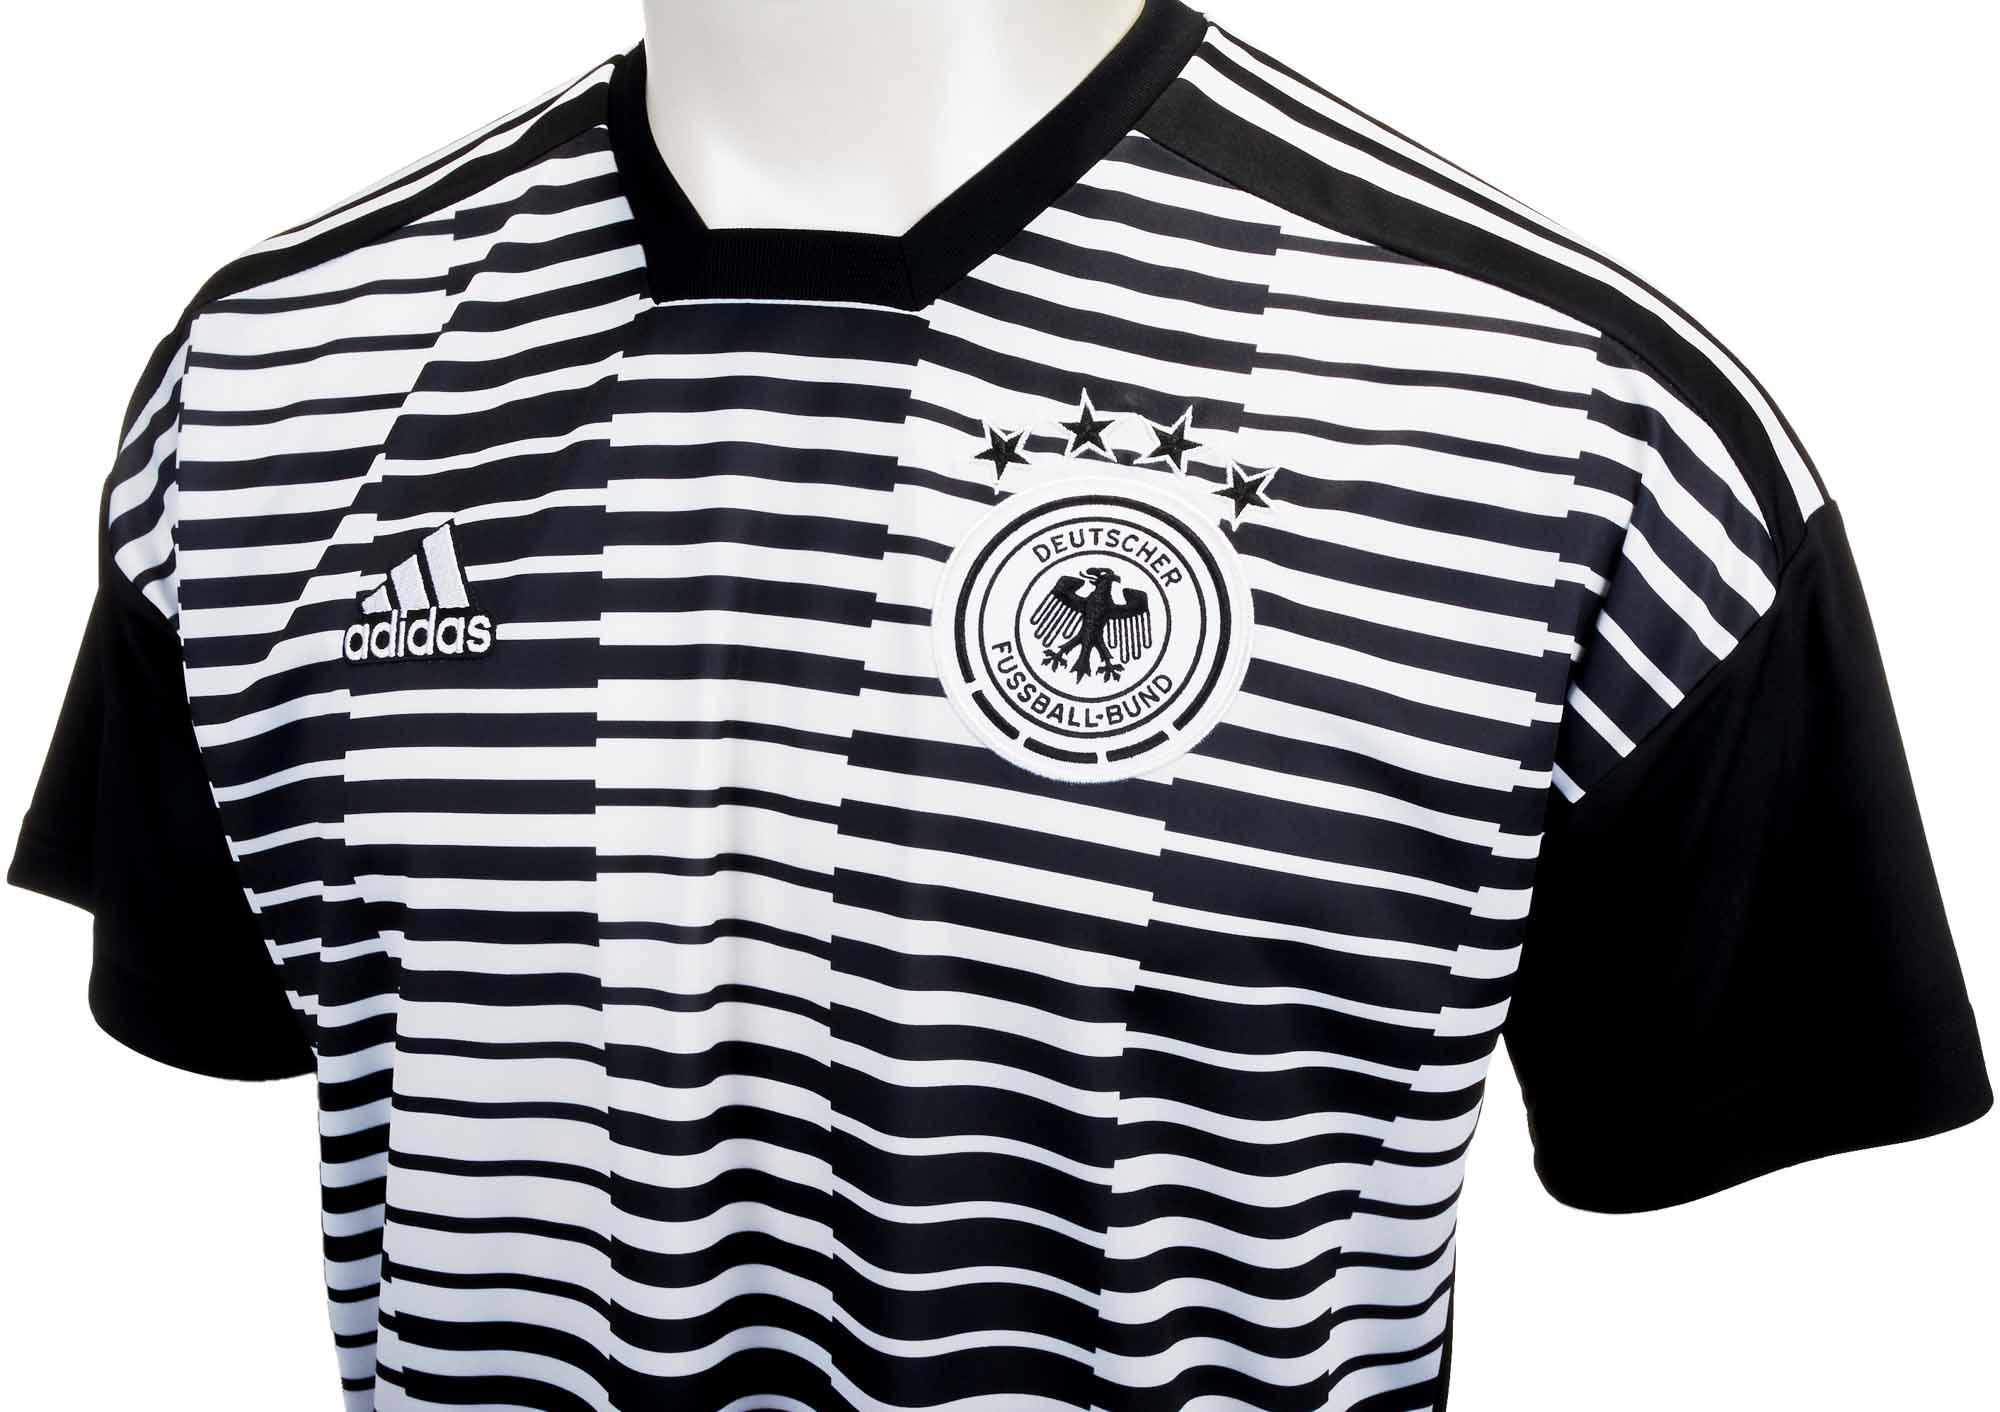 adidas Germany Pre-match Jersey - White & Black - SoccerPro.com